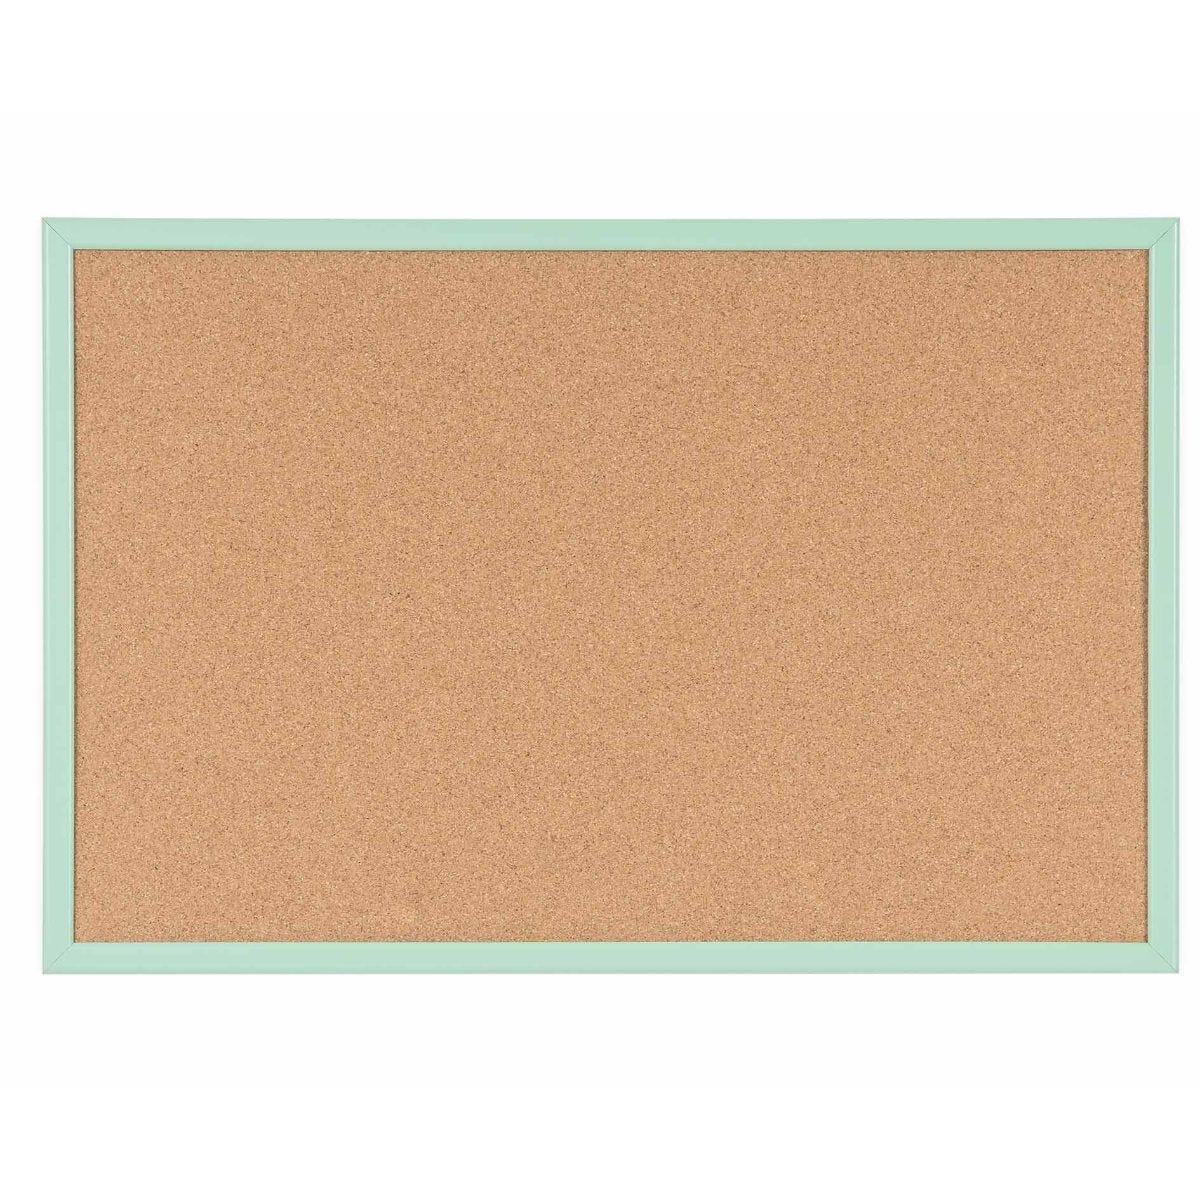 Cork Board Pastel Frame 600x400mm Green